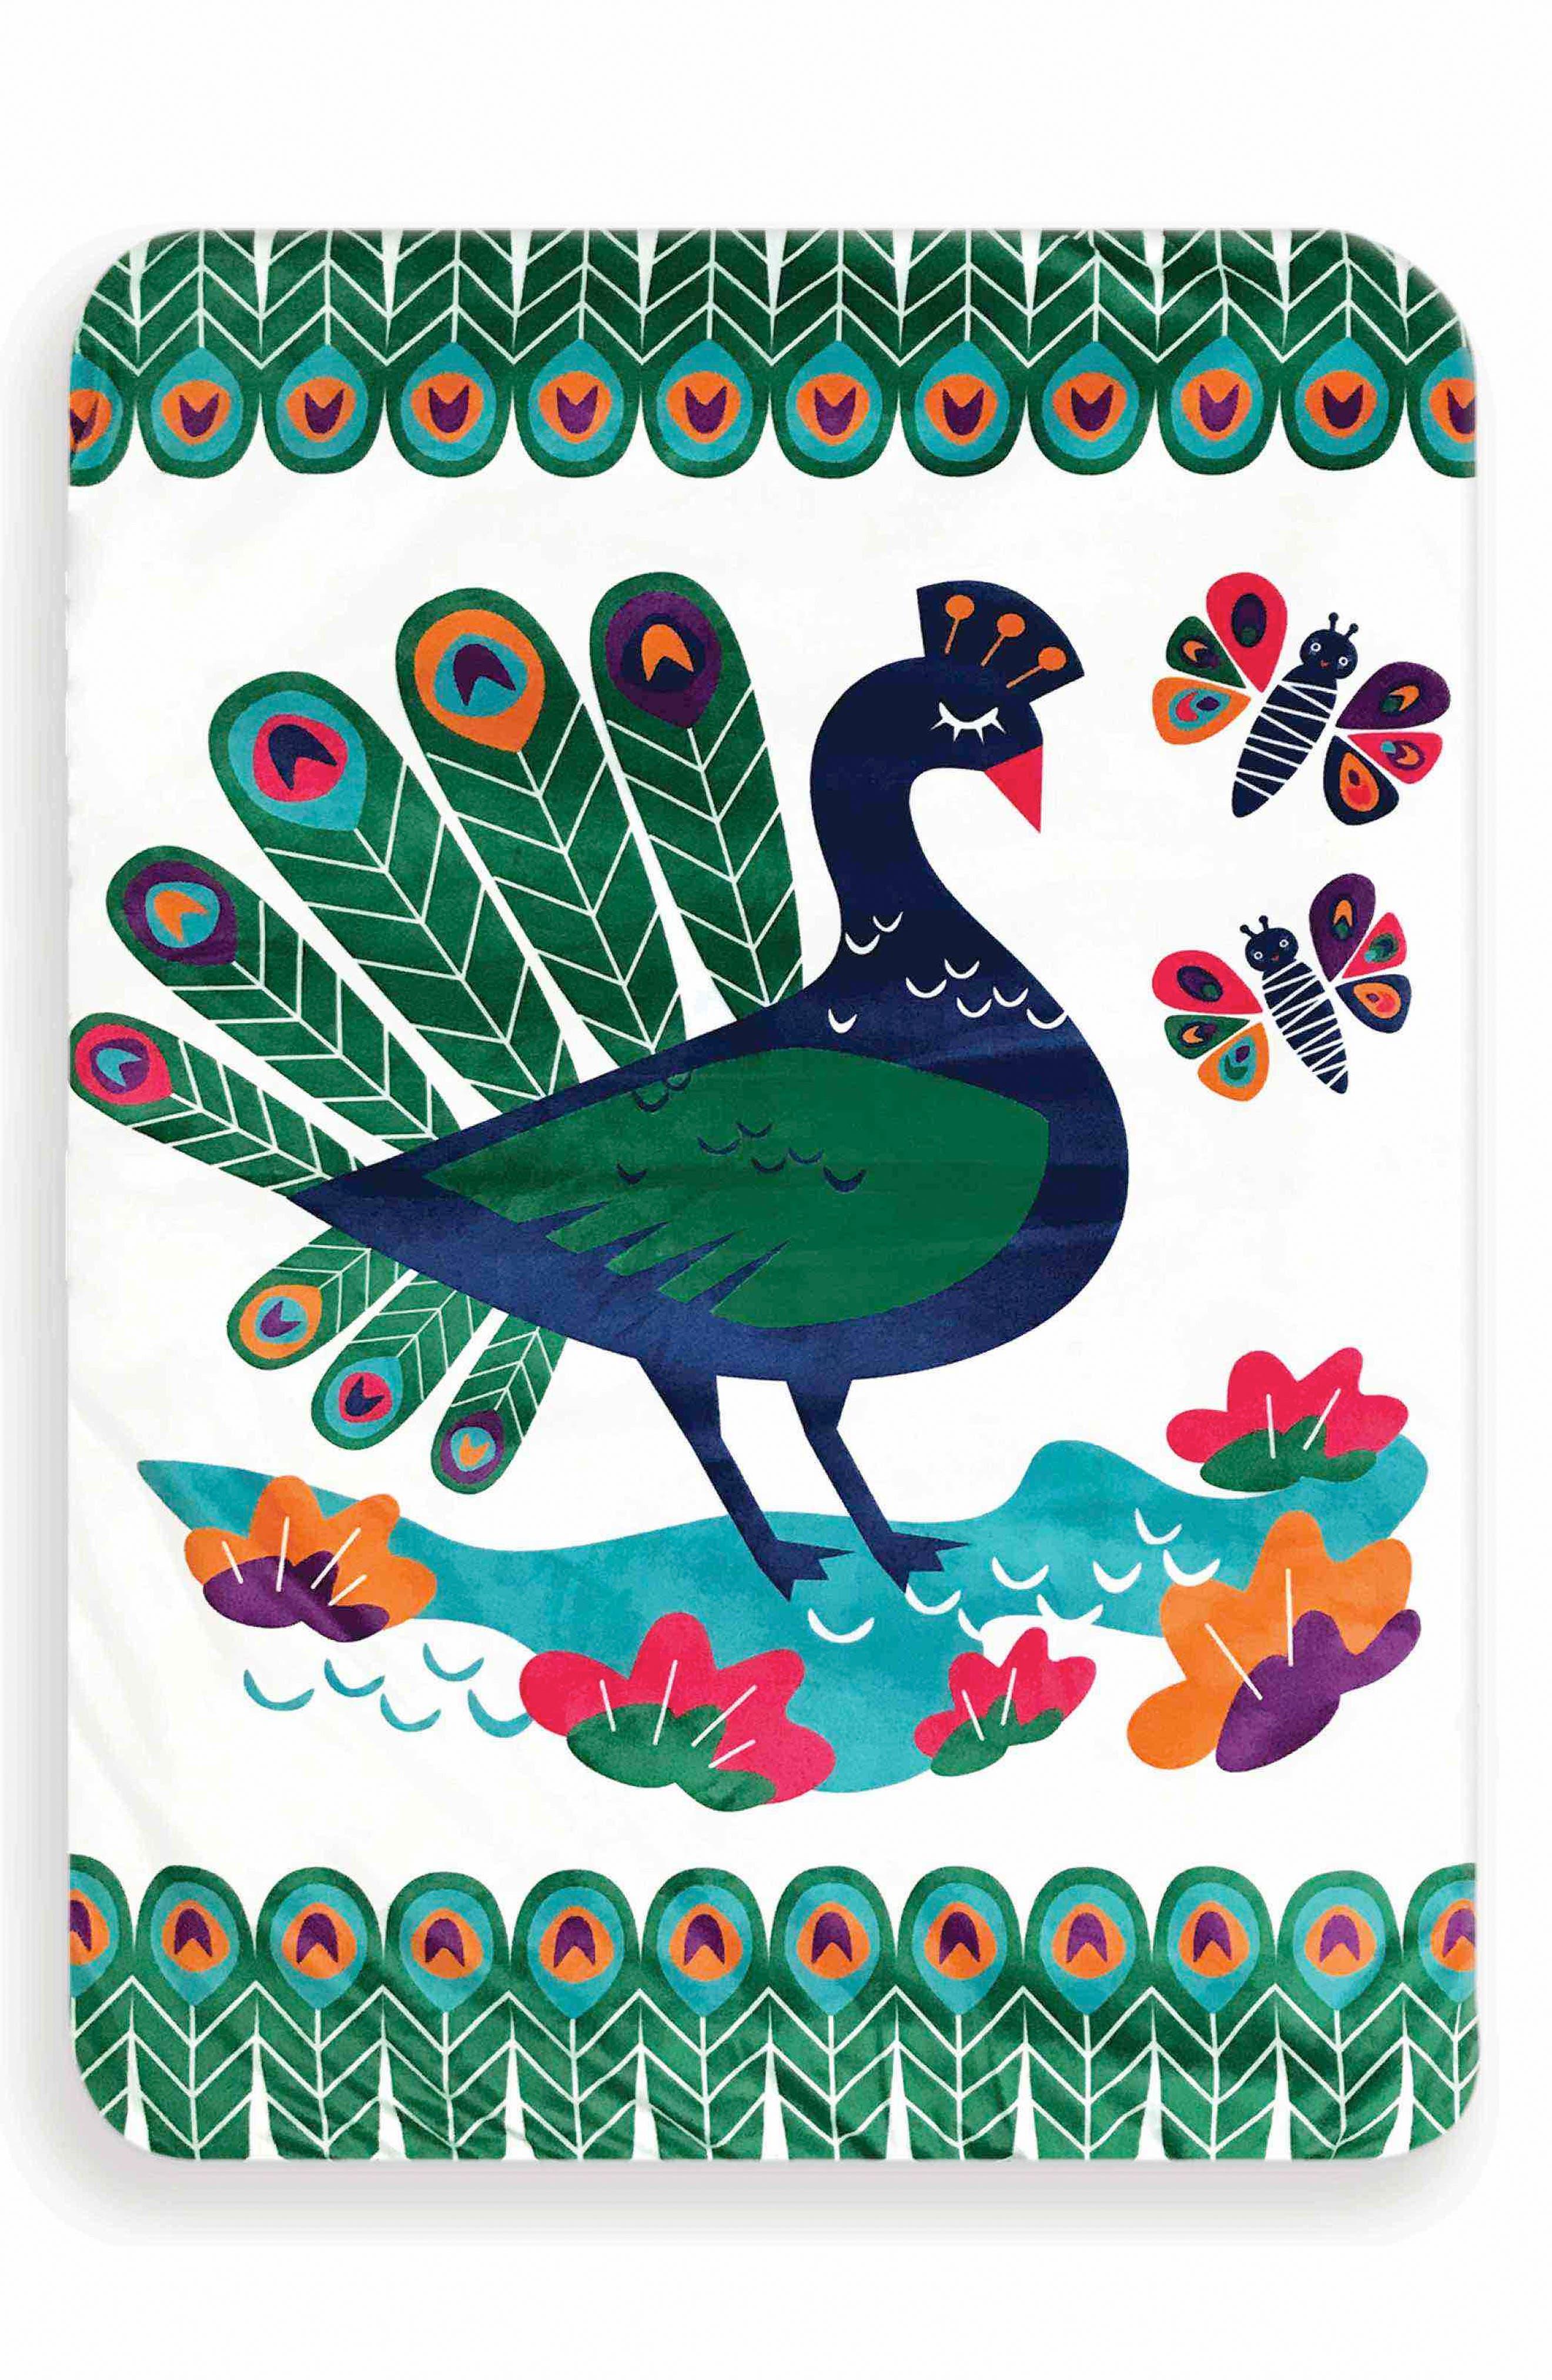 Peacock Paradise Play Mat,                             Main thumbnail 1, color,                             Green/ Blue/ Purple